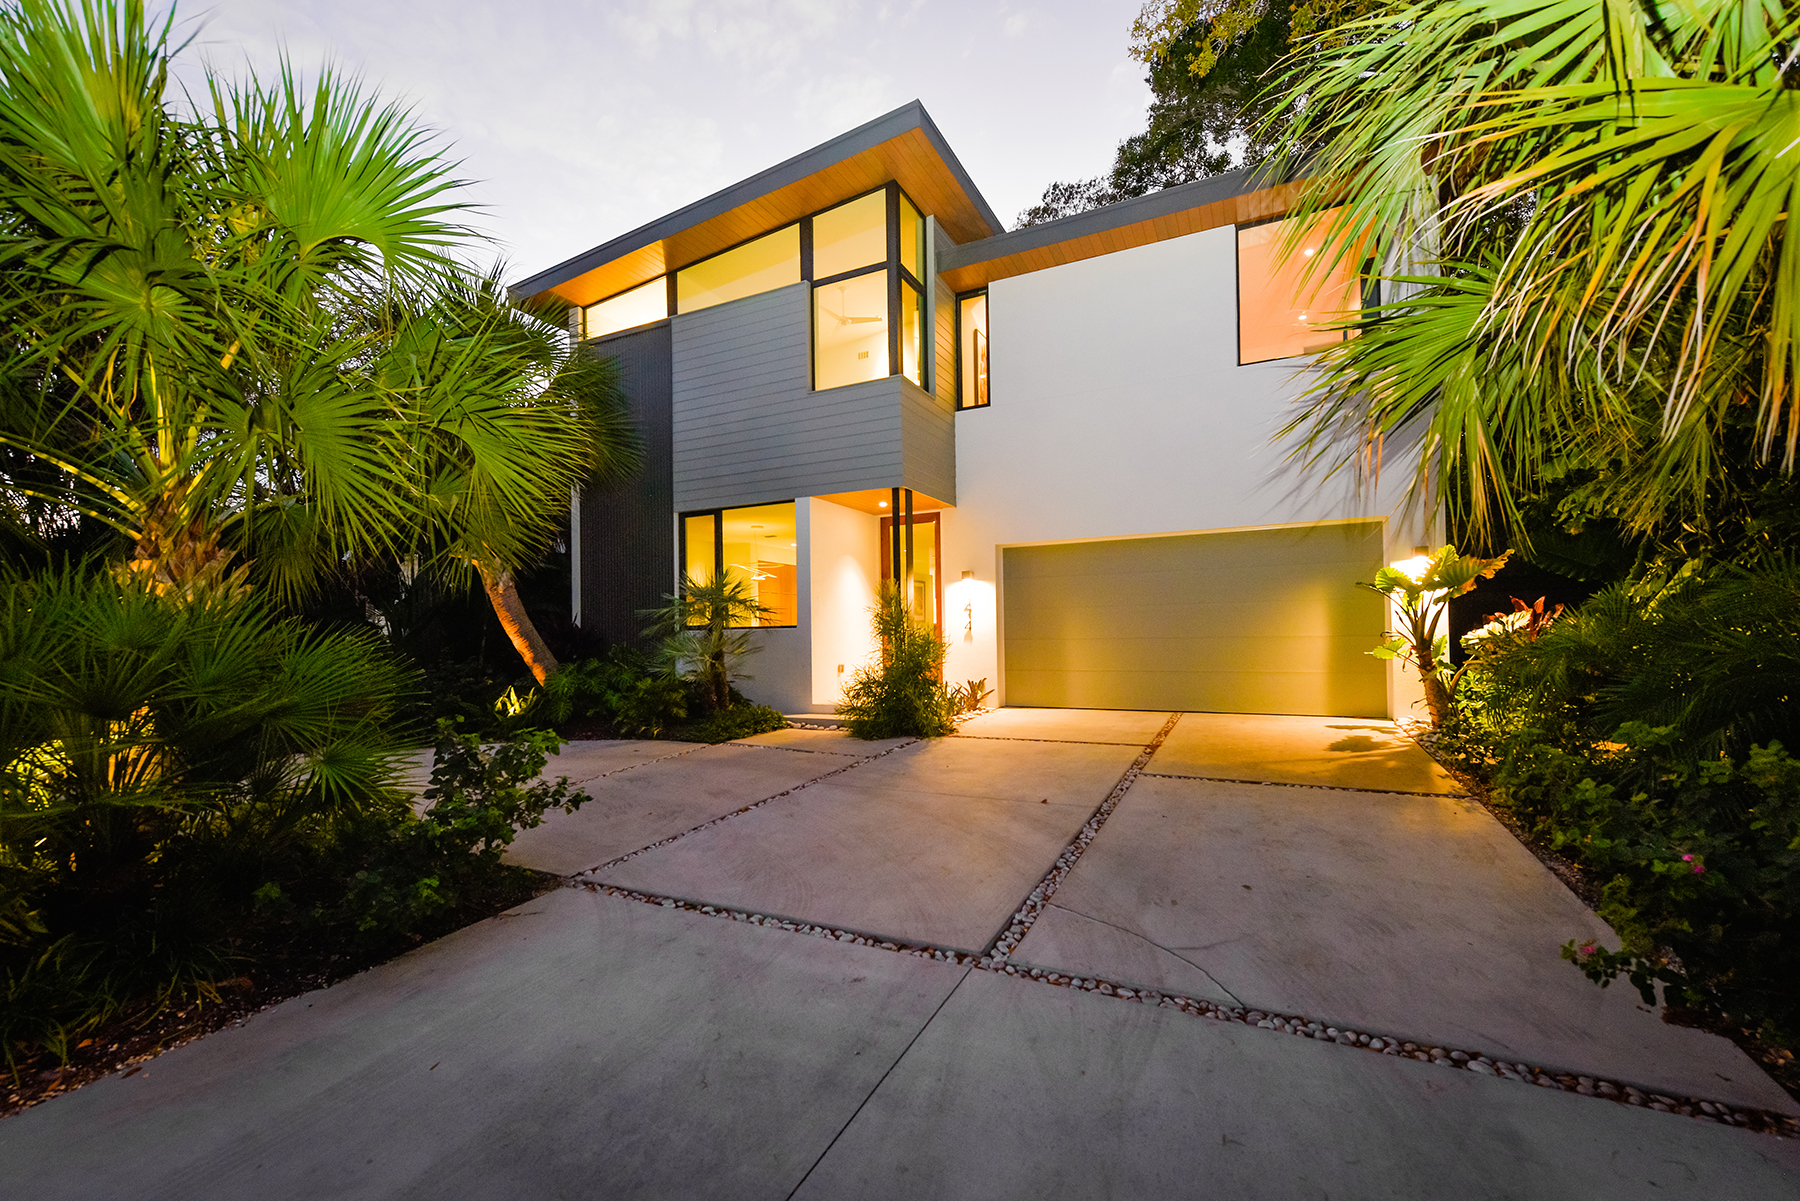 Single Family Home for Sale at SARASOTA 1414 S Osprey Ave Sarasota, Florida, 34239 United States